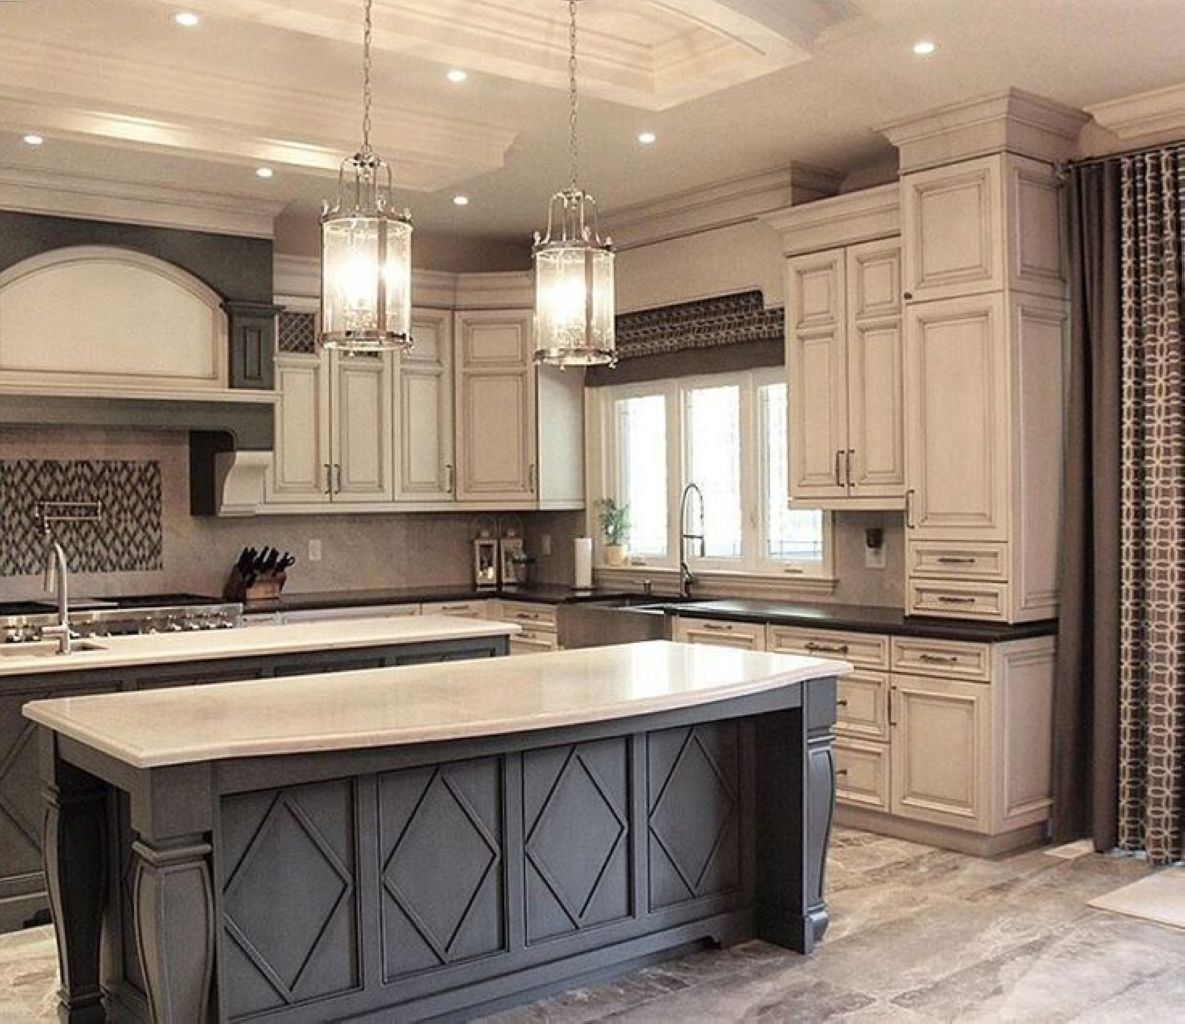 Most Updated] 9+ Stylish Kitchen Cabinet Design Ideas In 9 ...